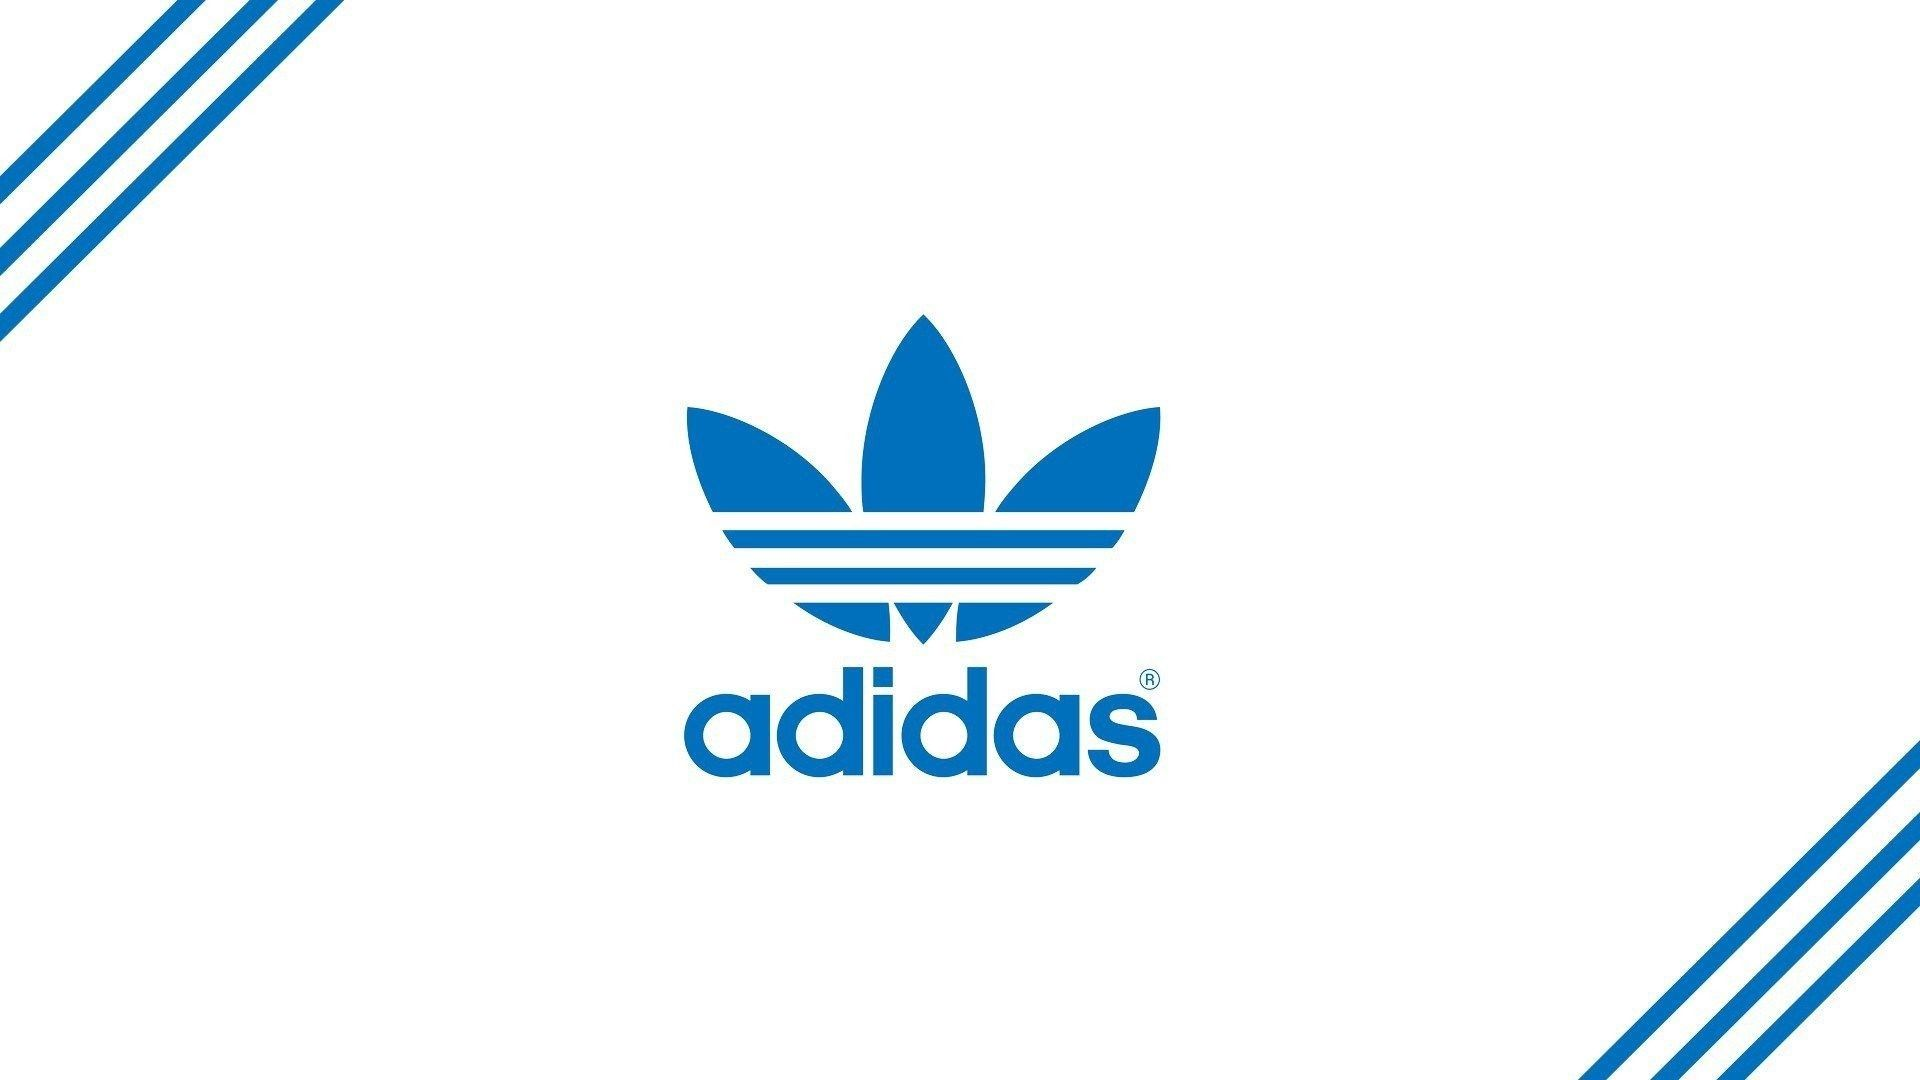 adidas spezial wallpaper